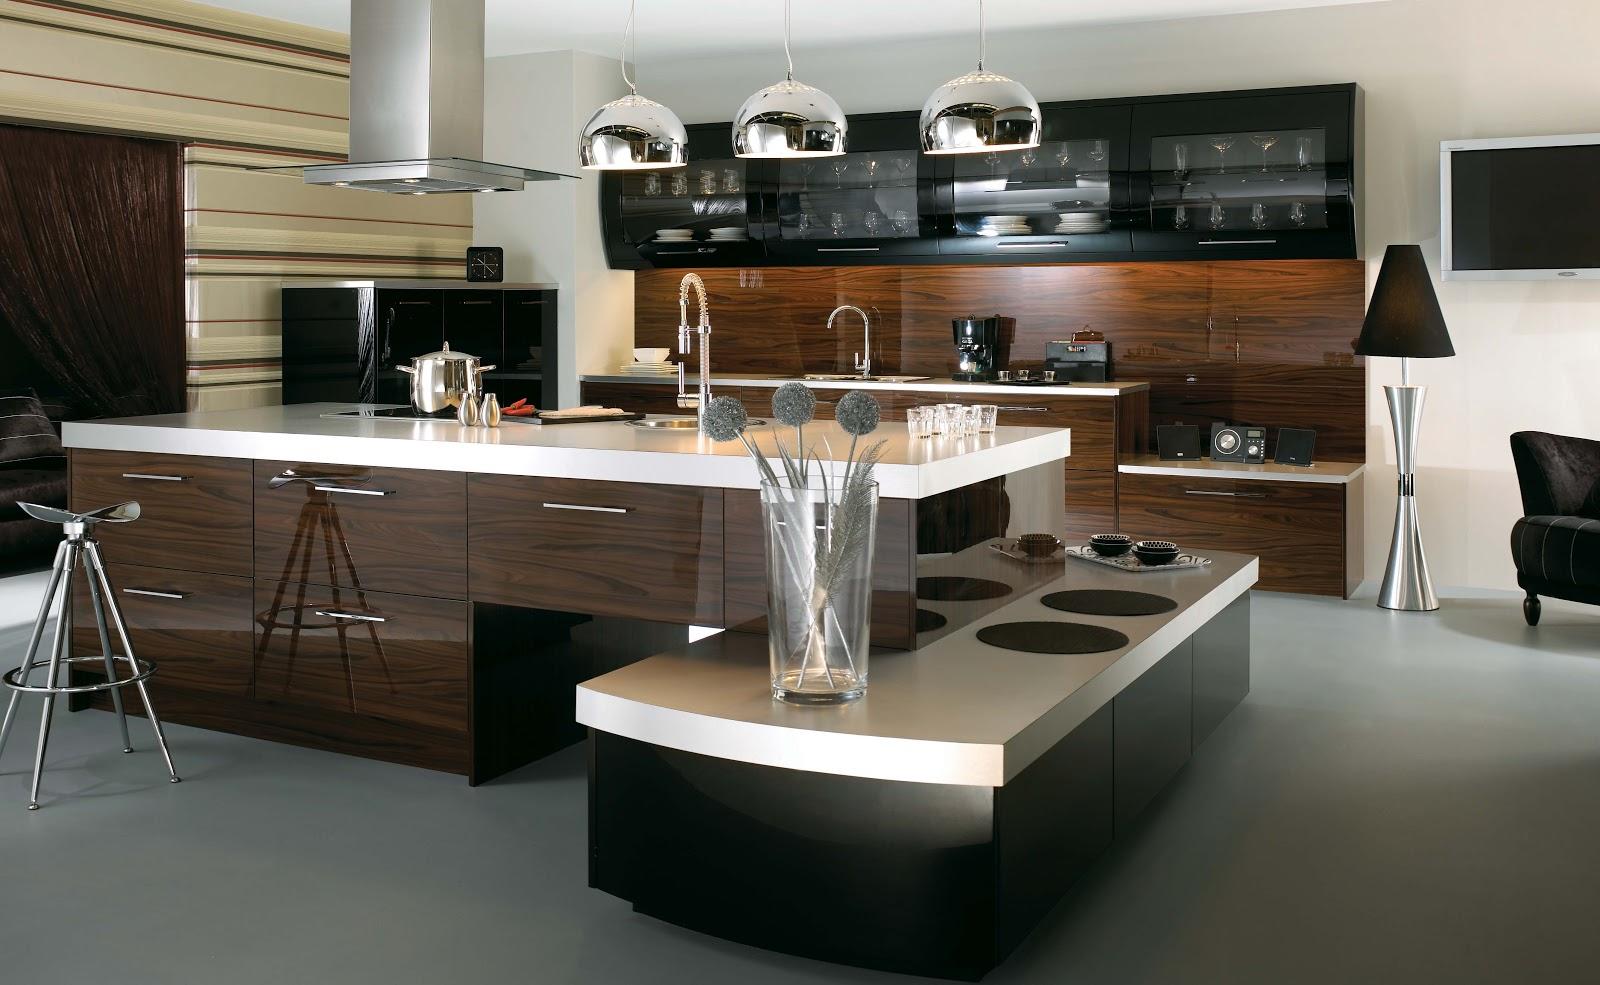 Bellitudoo: Luksusowe Kuchnie